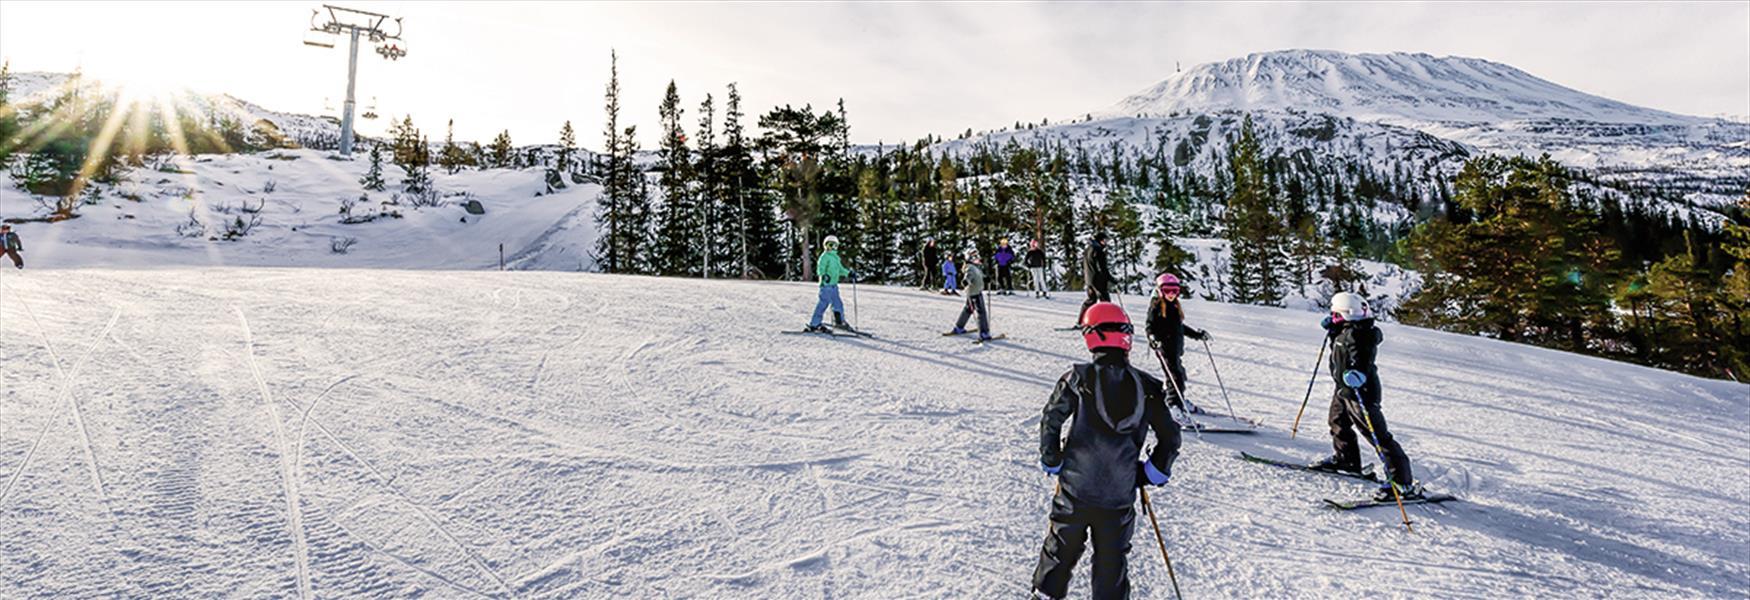 Gausta ski resort